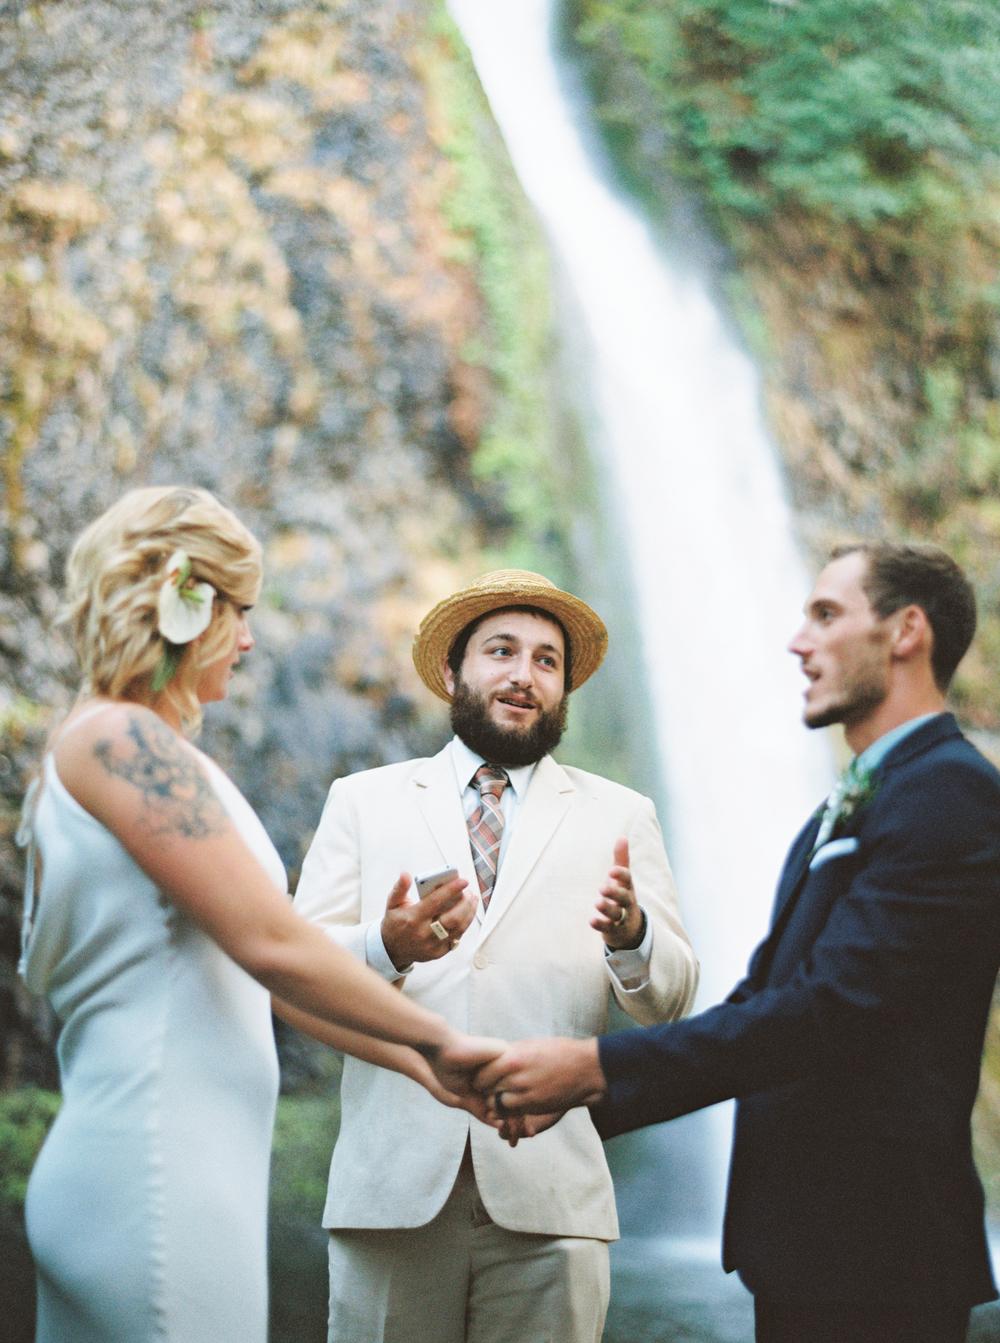 048Outlive+Creative+Tropical+Northwest+Columbia+Gorge+Elopement+Film+Photographer.jpg